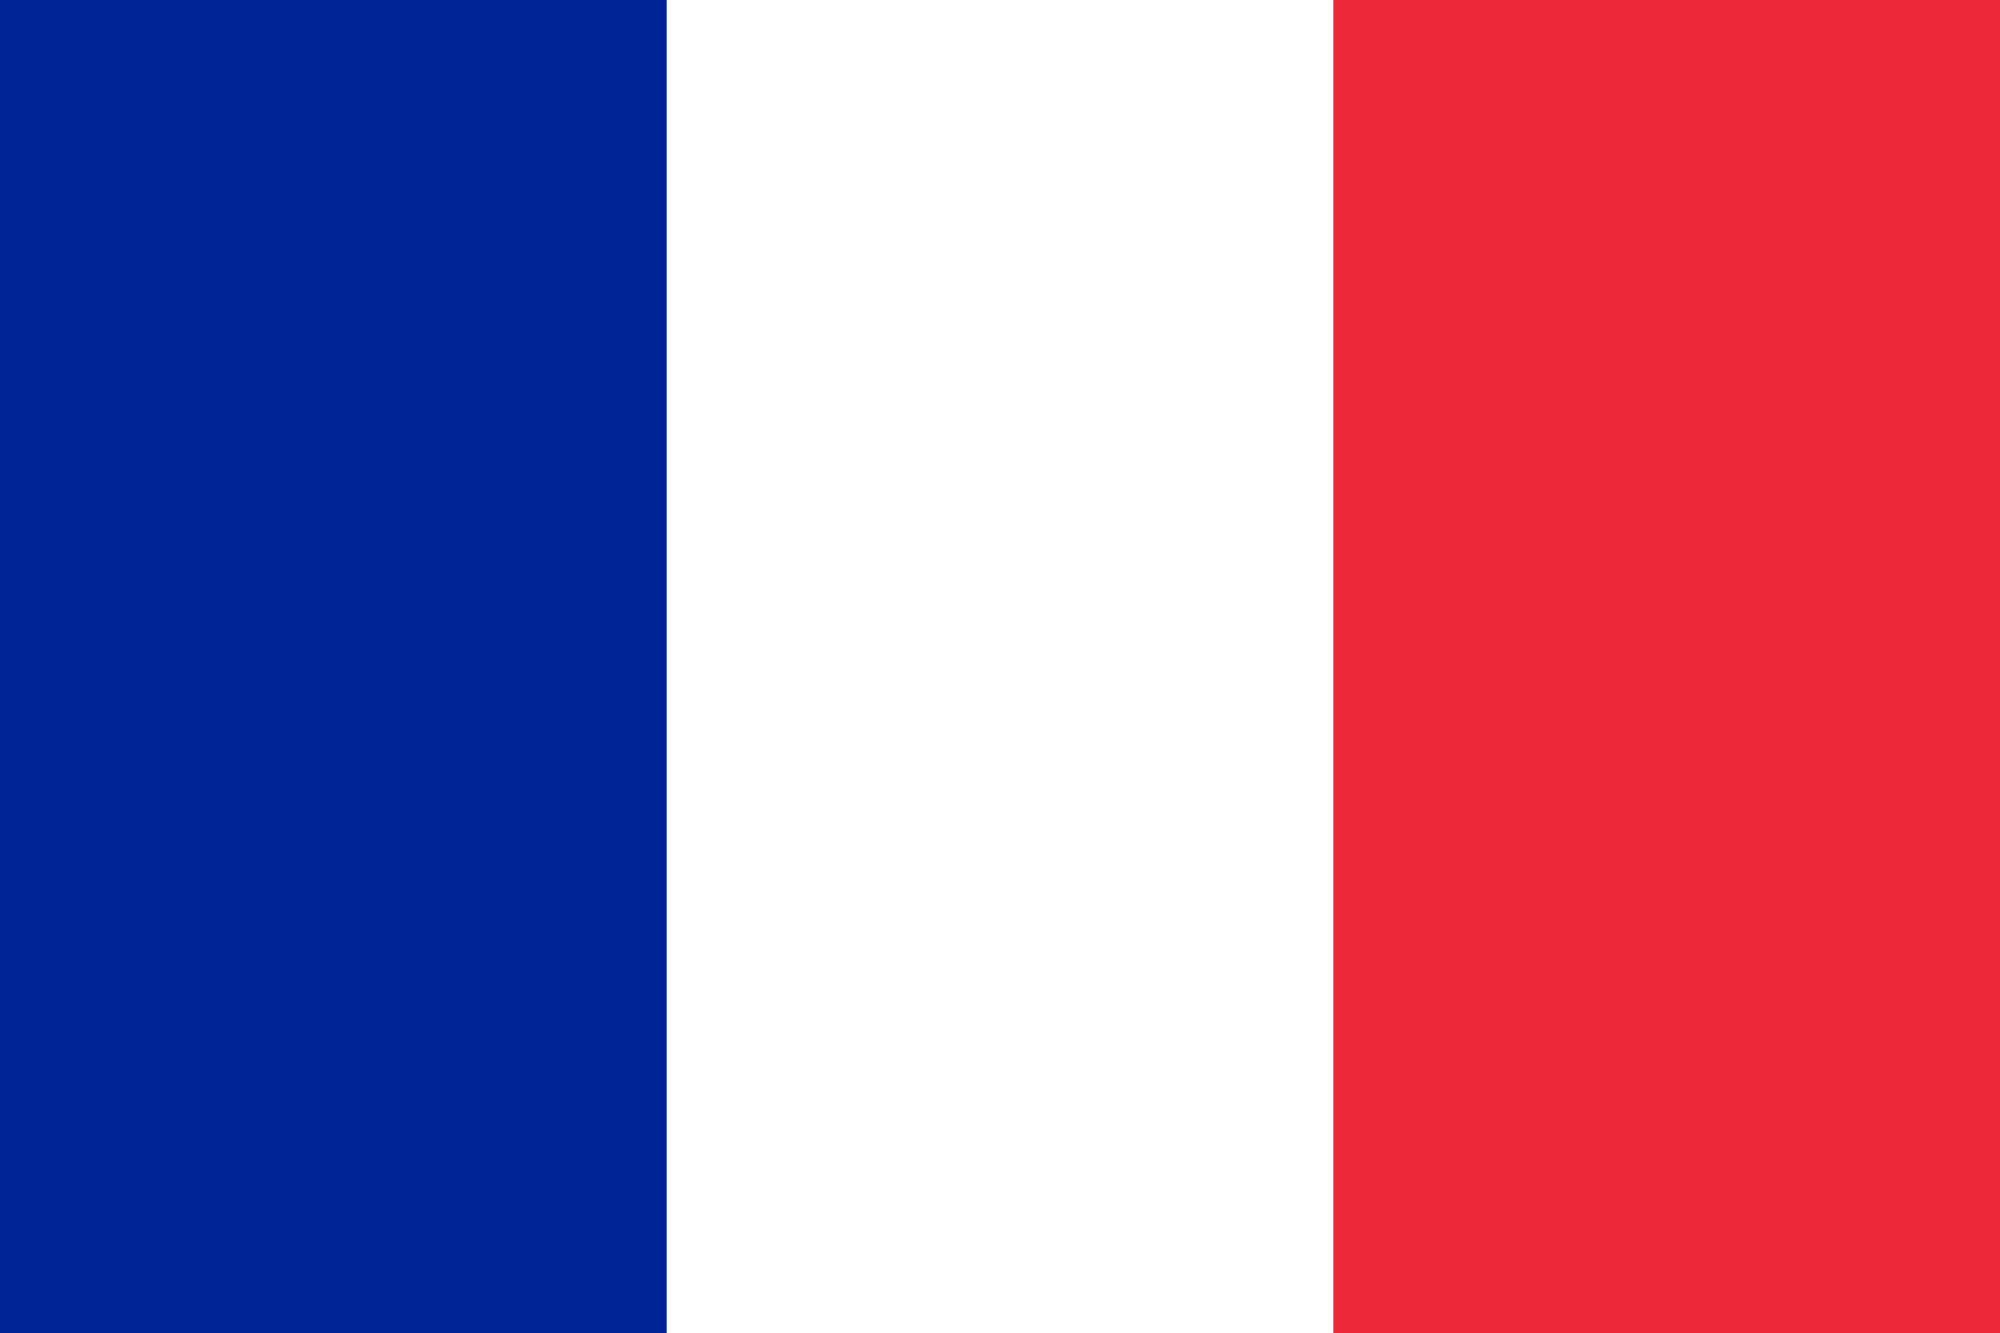 Themen dekoration frankreich flagge fahne for Frankreich dekoration